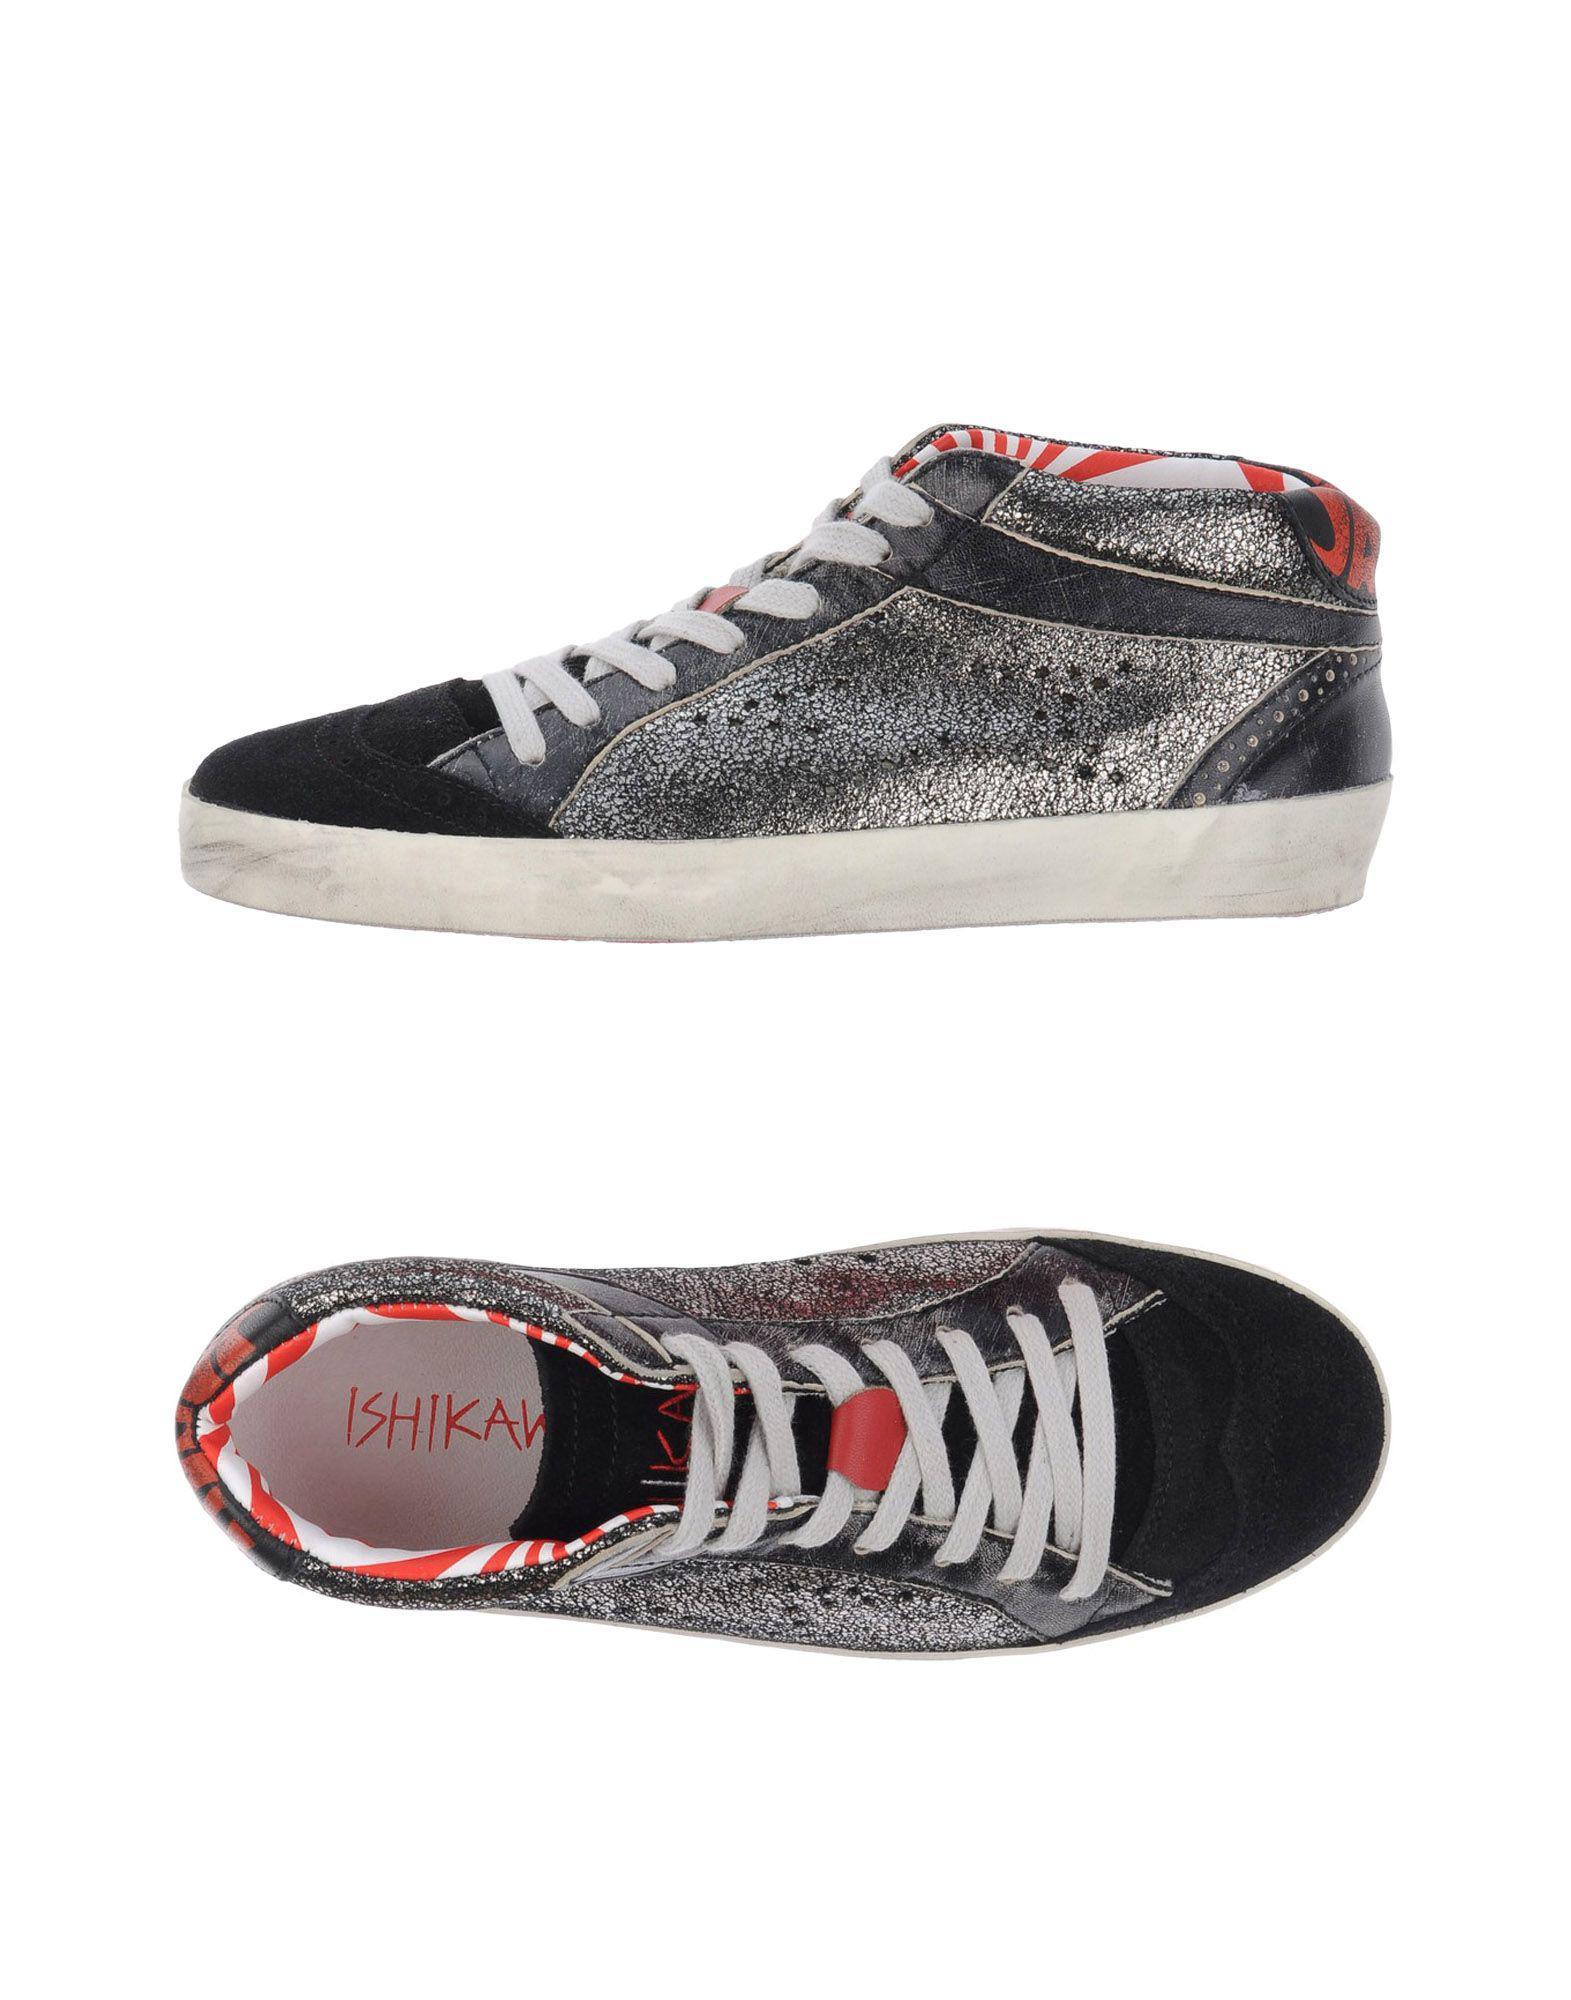 Ishikawa Bas-tops Et Chaussures De Sport Y5bq1x